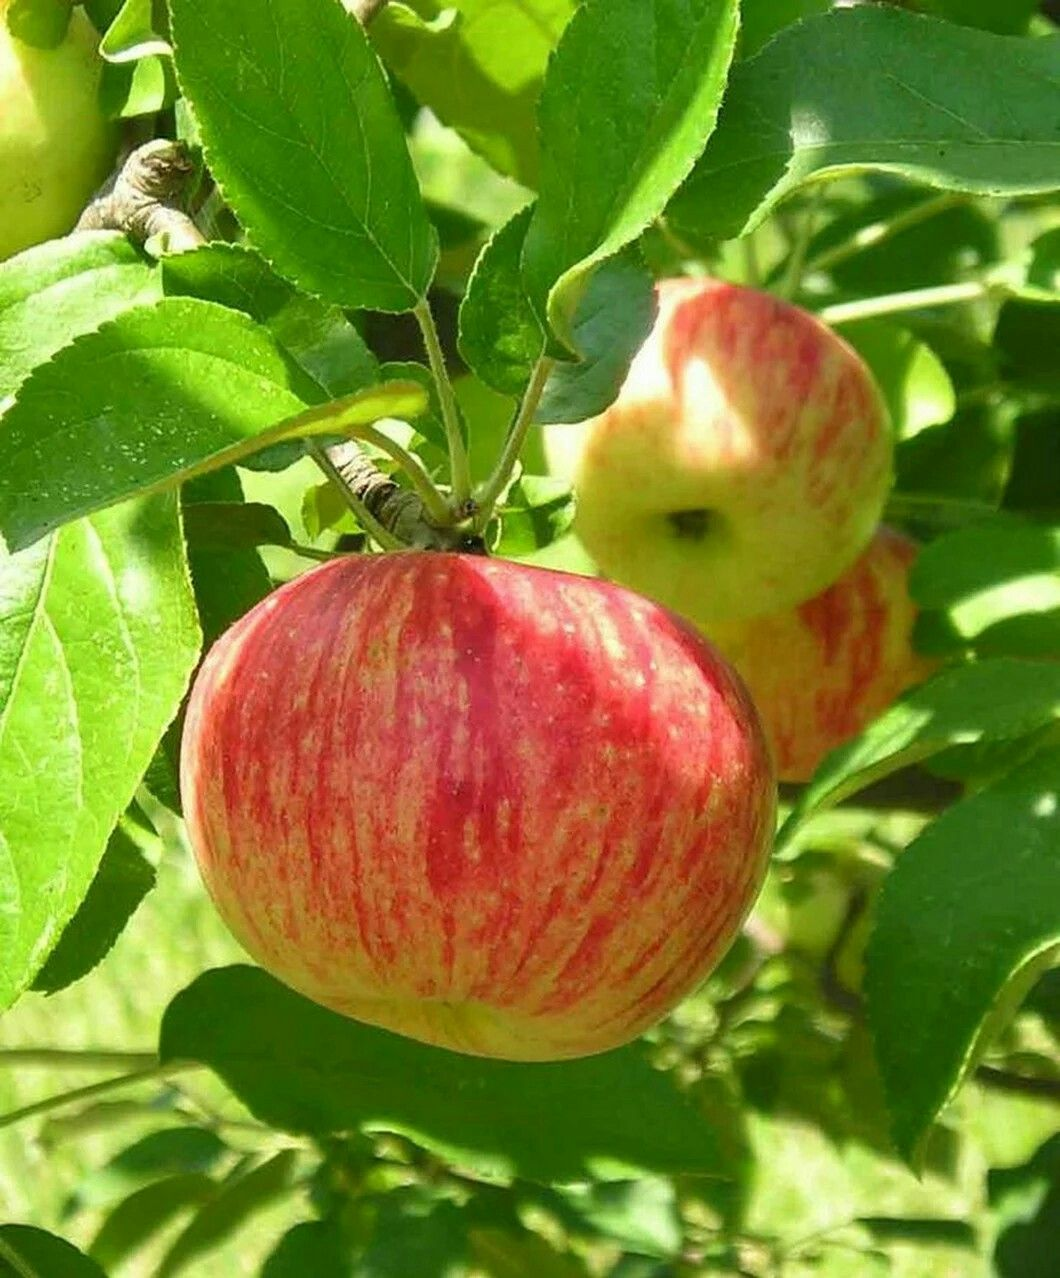 Pin By Rossler Katka On Buah Apple Tree Nursery Fruit Garden Fall Garden Vegetables